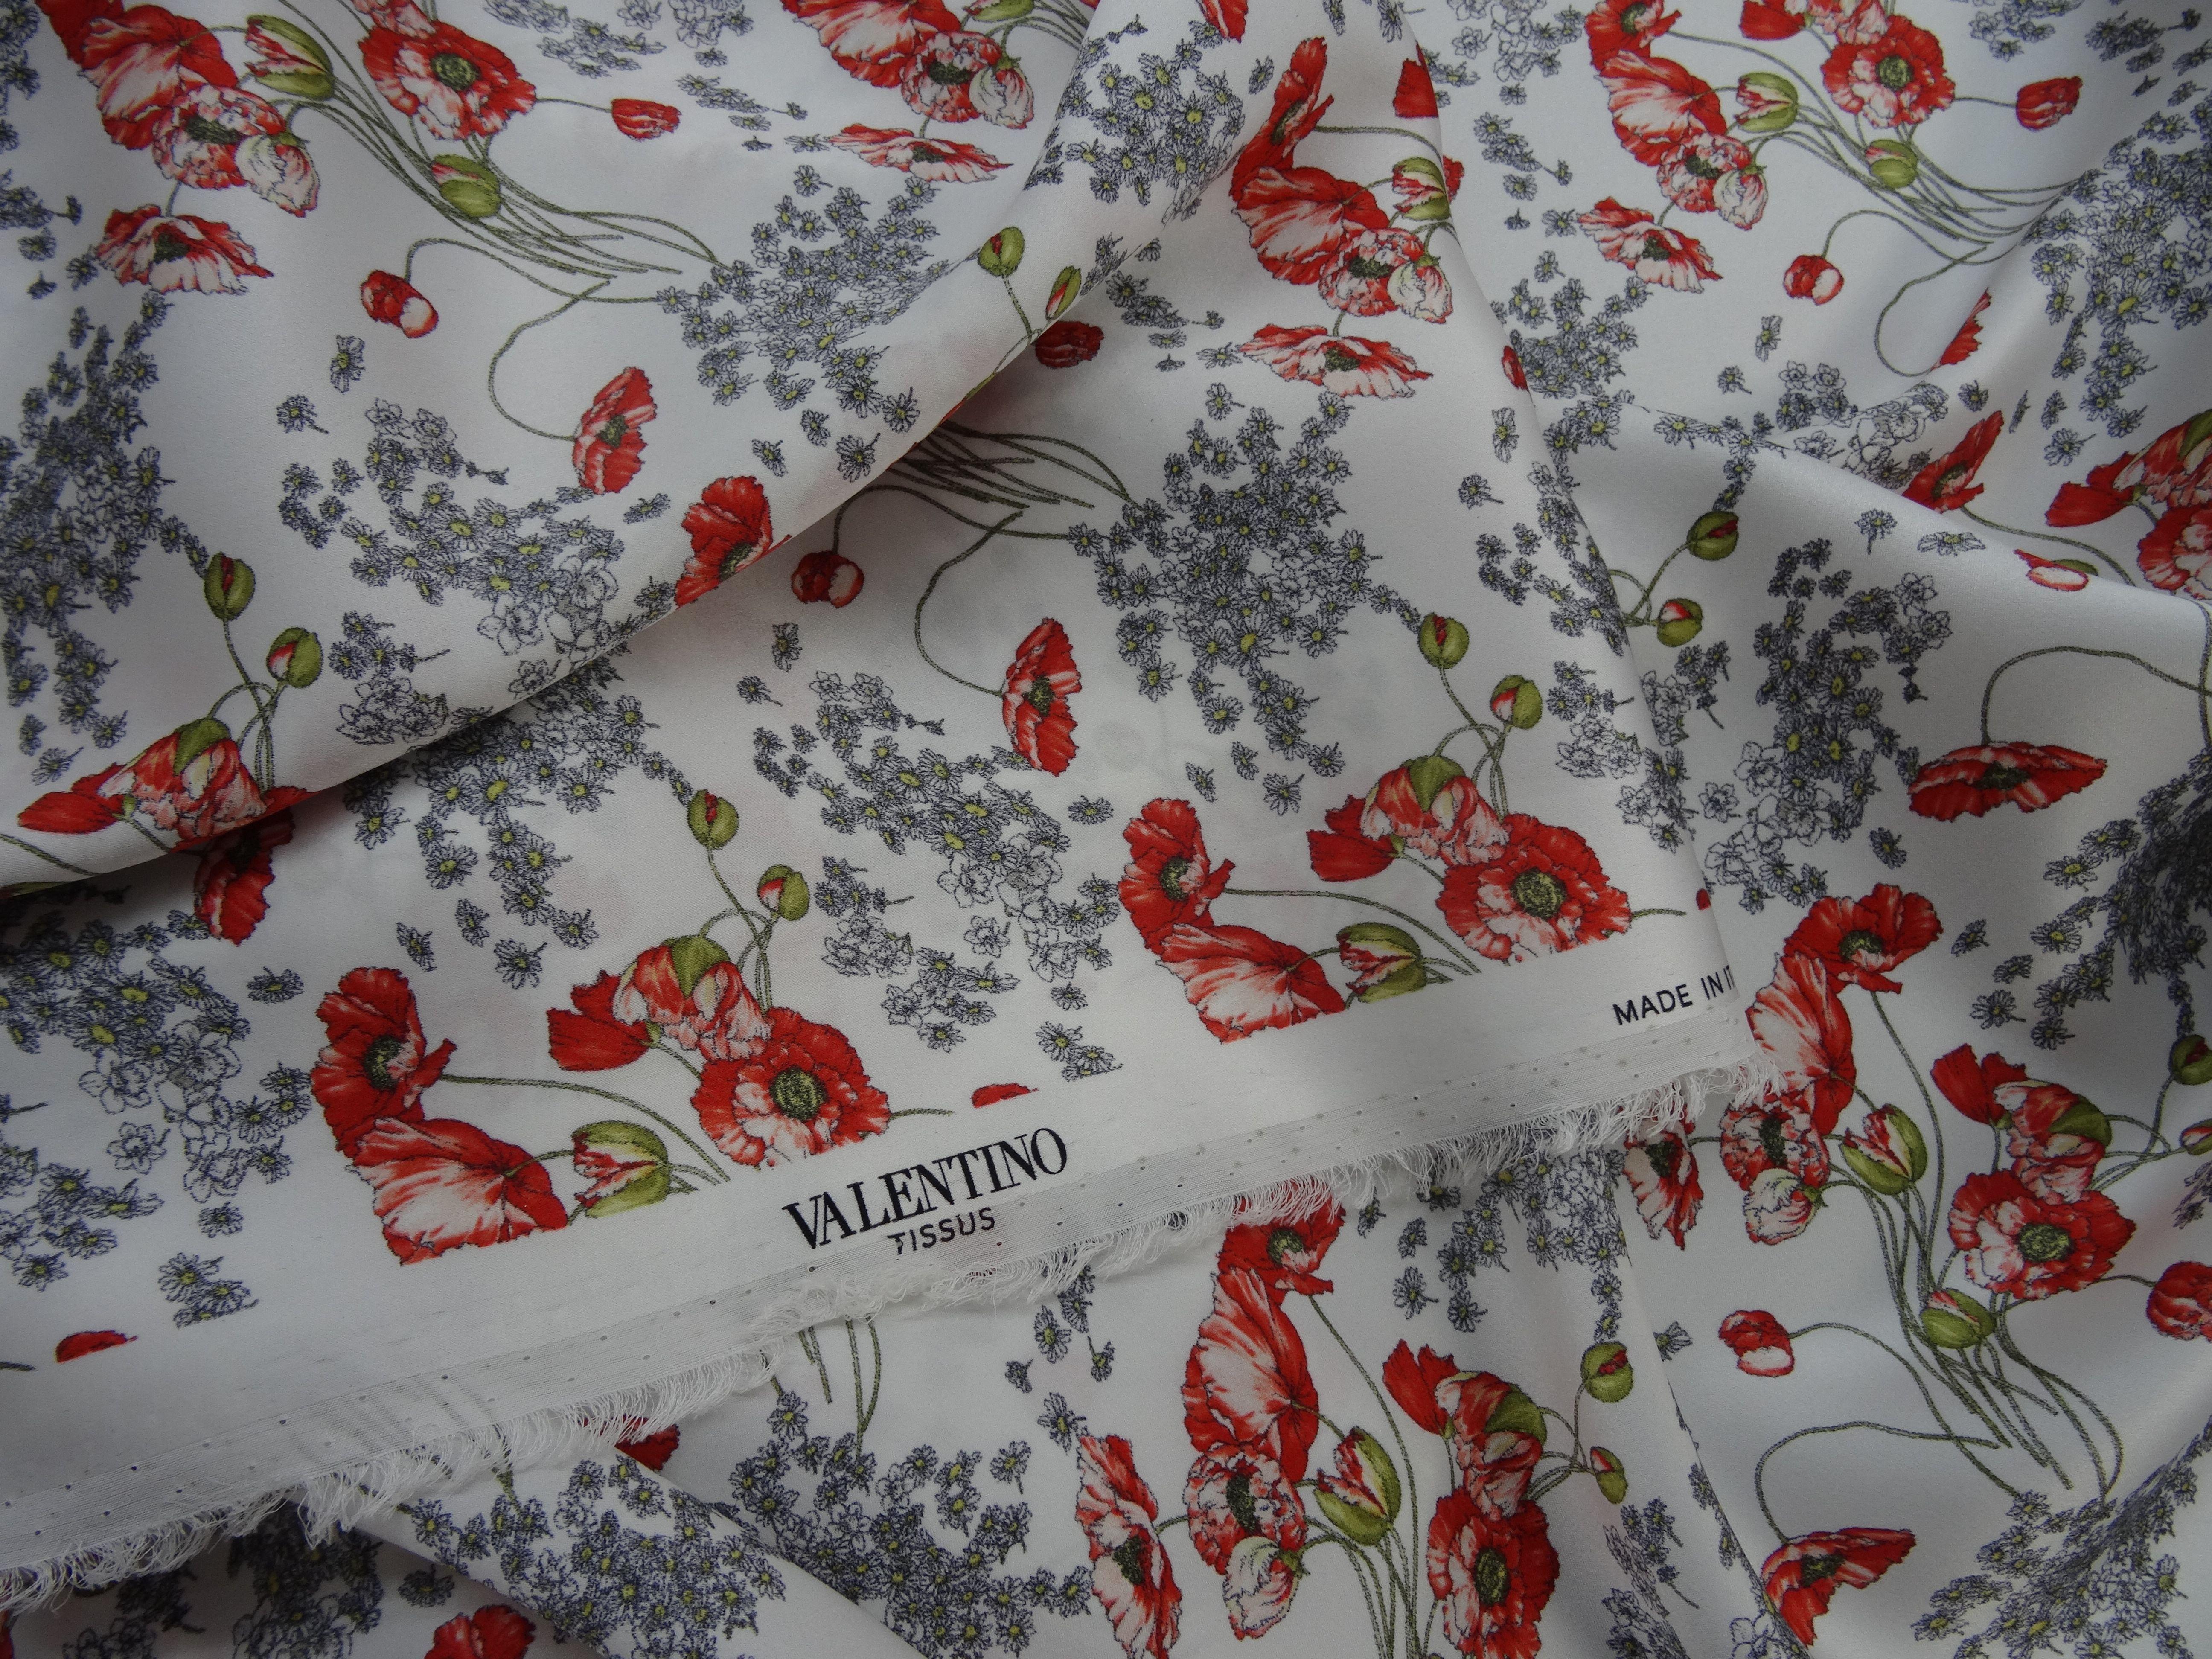 Valentino Fabric At Jasons Shop Of London Silk Flowers Designer